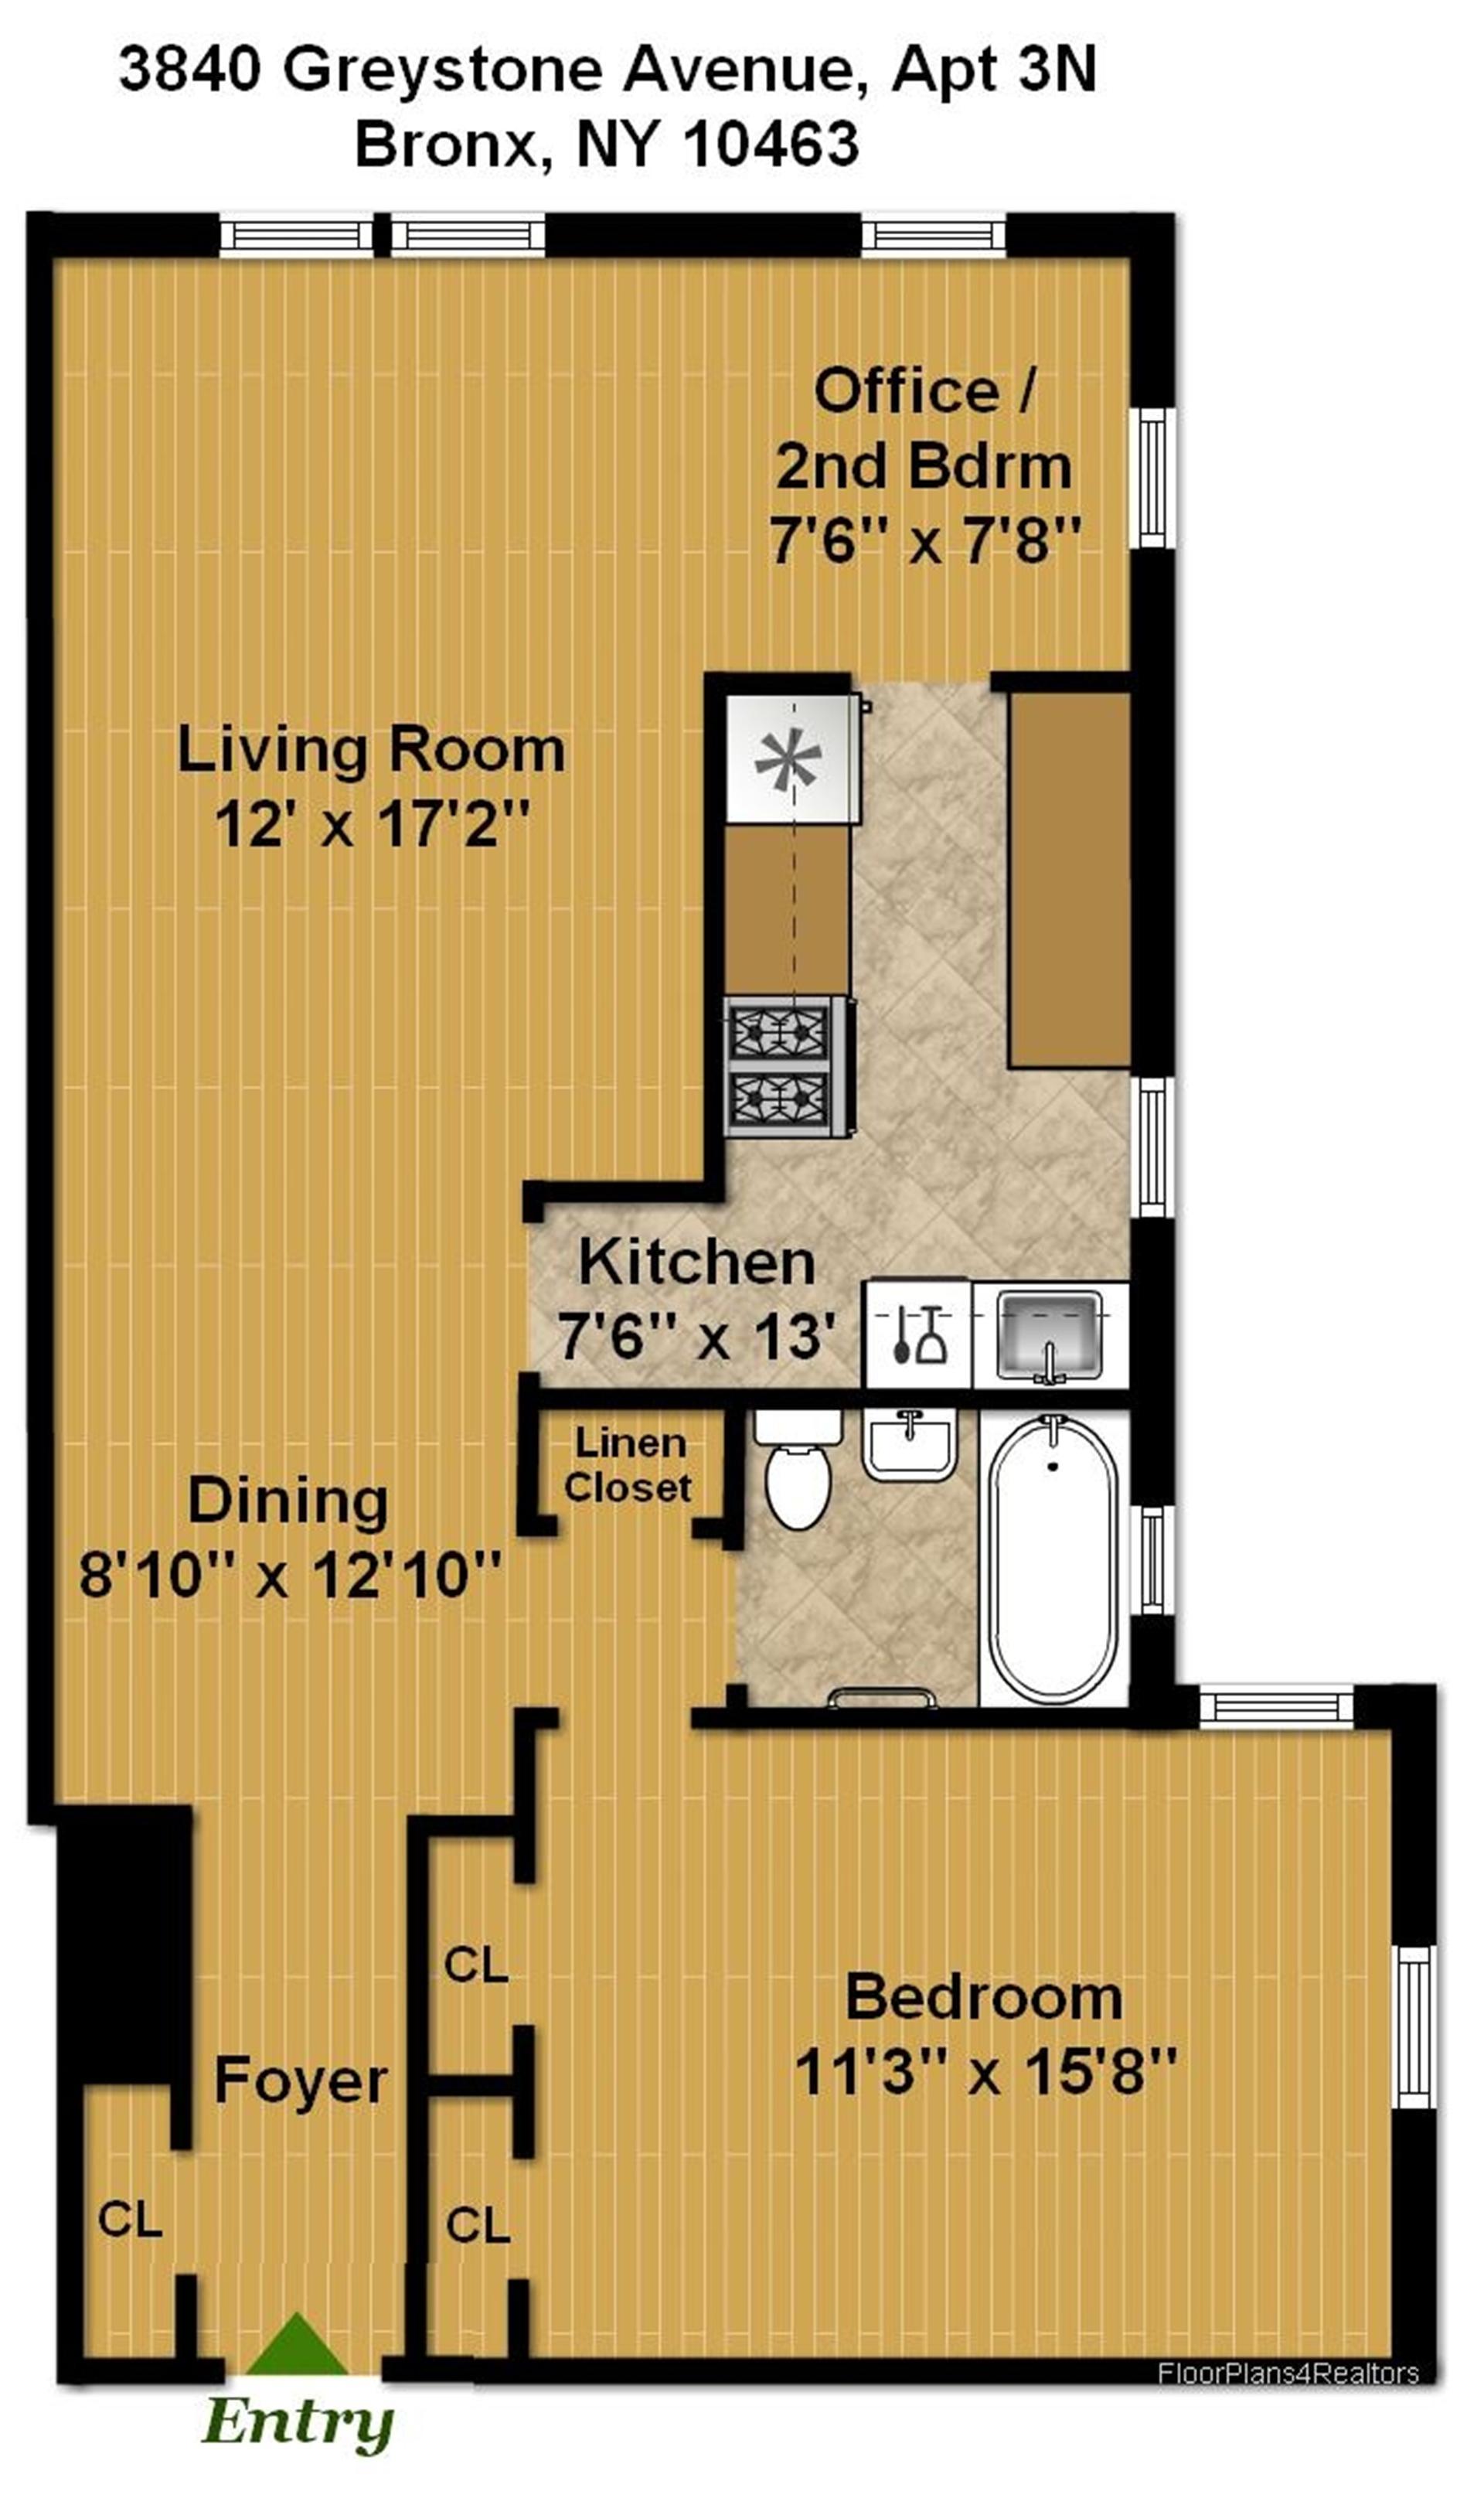 Gainesville Luxury Designer Home: Co-op Apartment Sale In